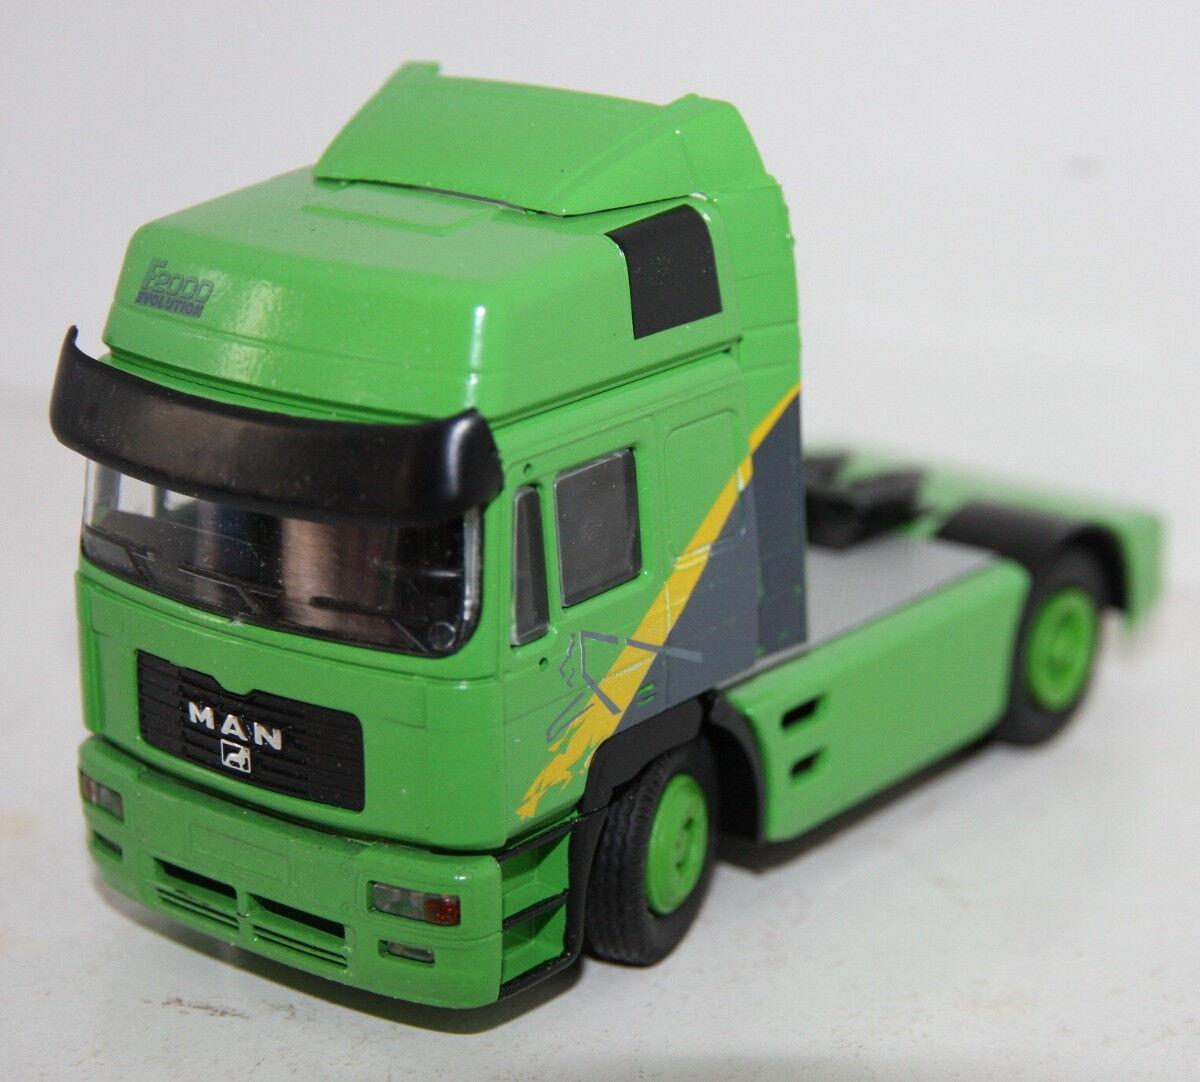 mas preferencial CON6100 04 - Camion Camion Camion 4x2 MAN F2000 verde - 1 50  deportes calientes